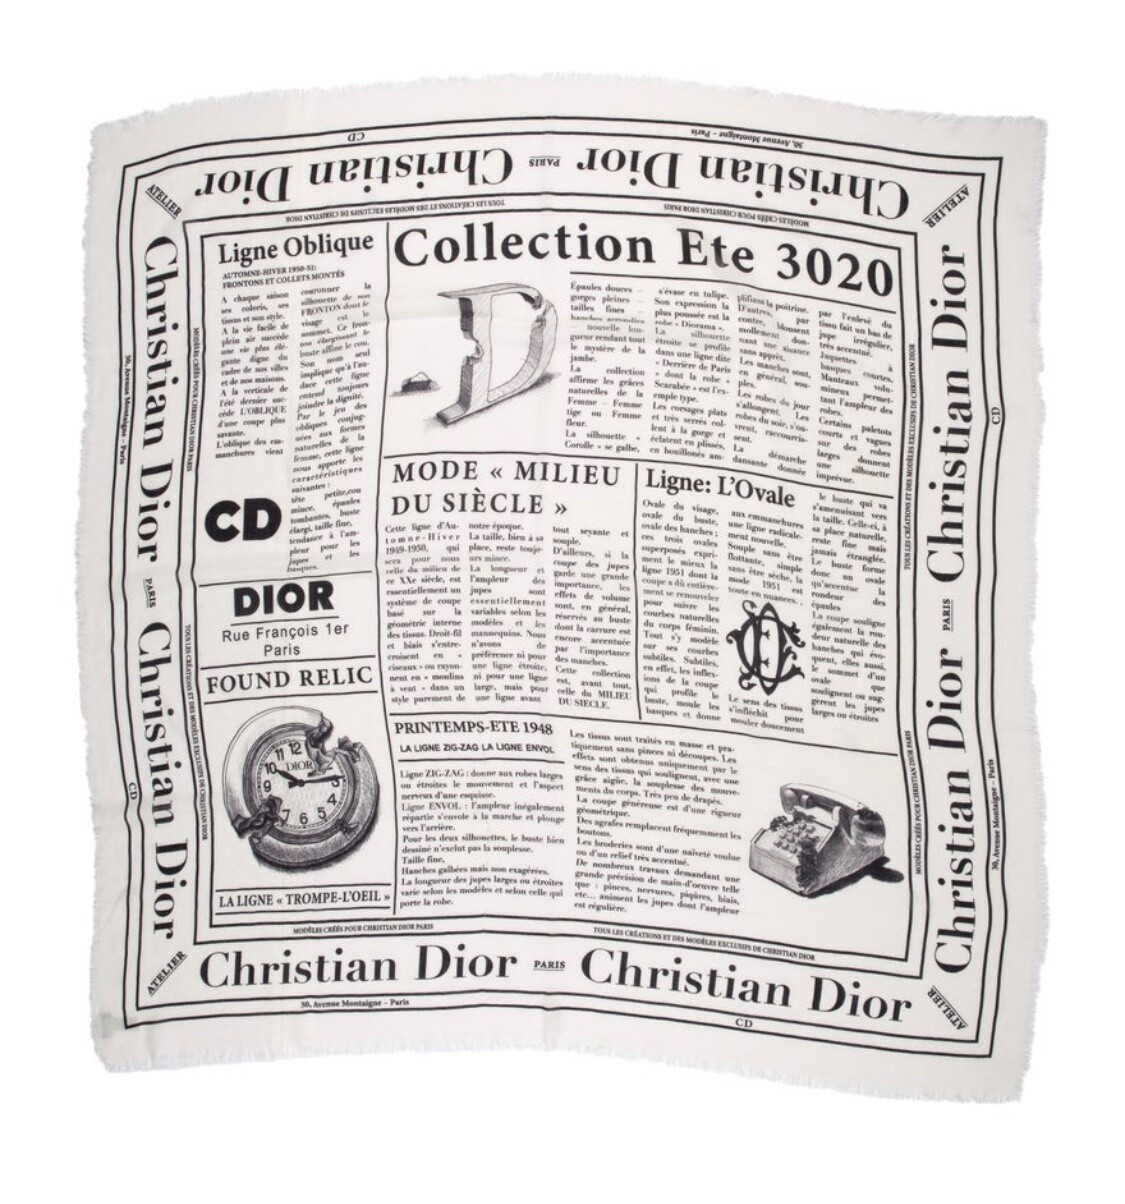 CHRISTIAN DIOR NEWSPRINT NEWS PAPER PRINT WOOL SCARF